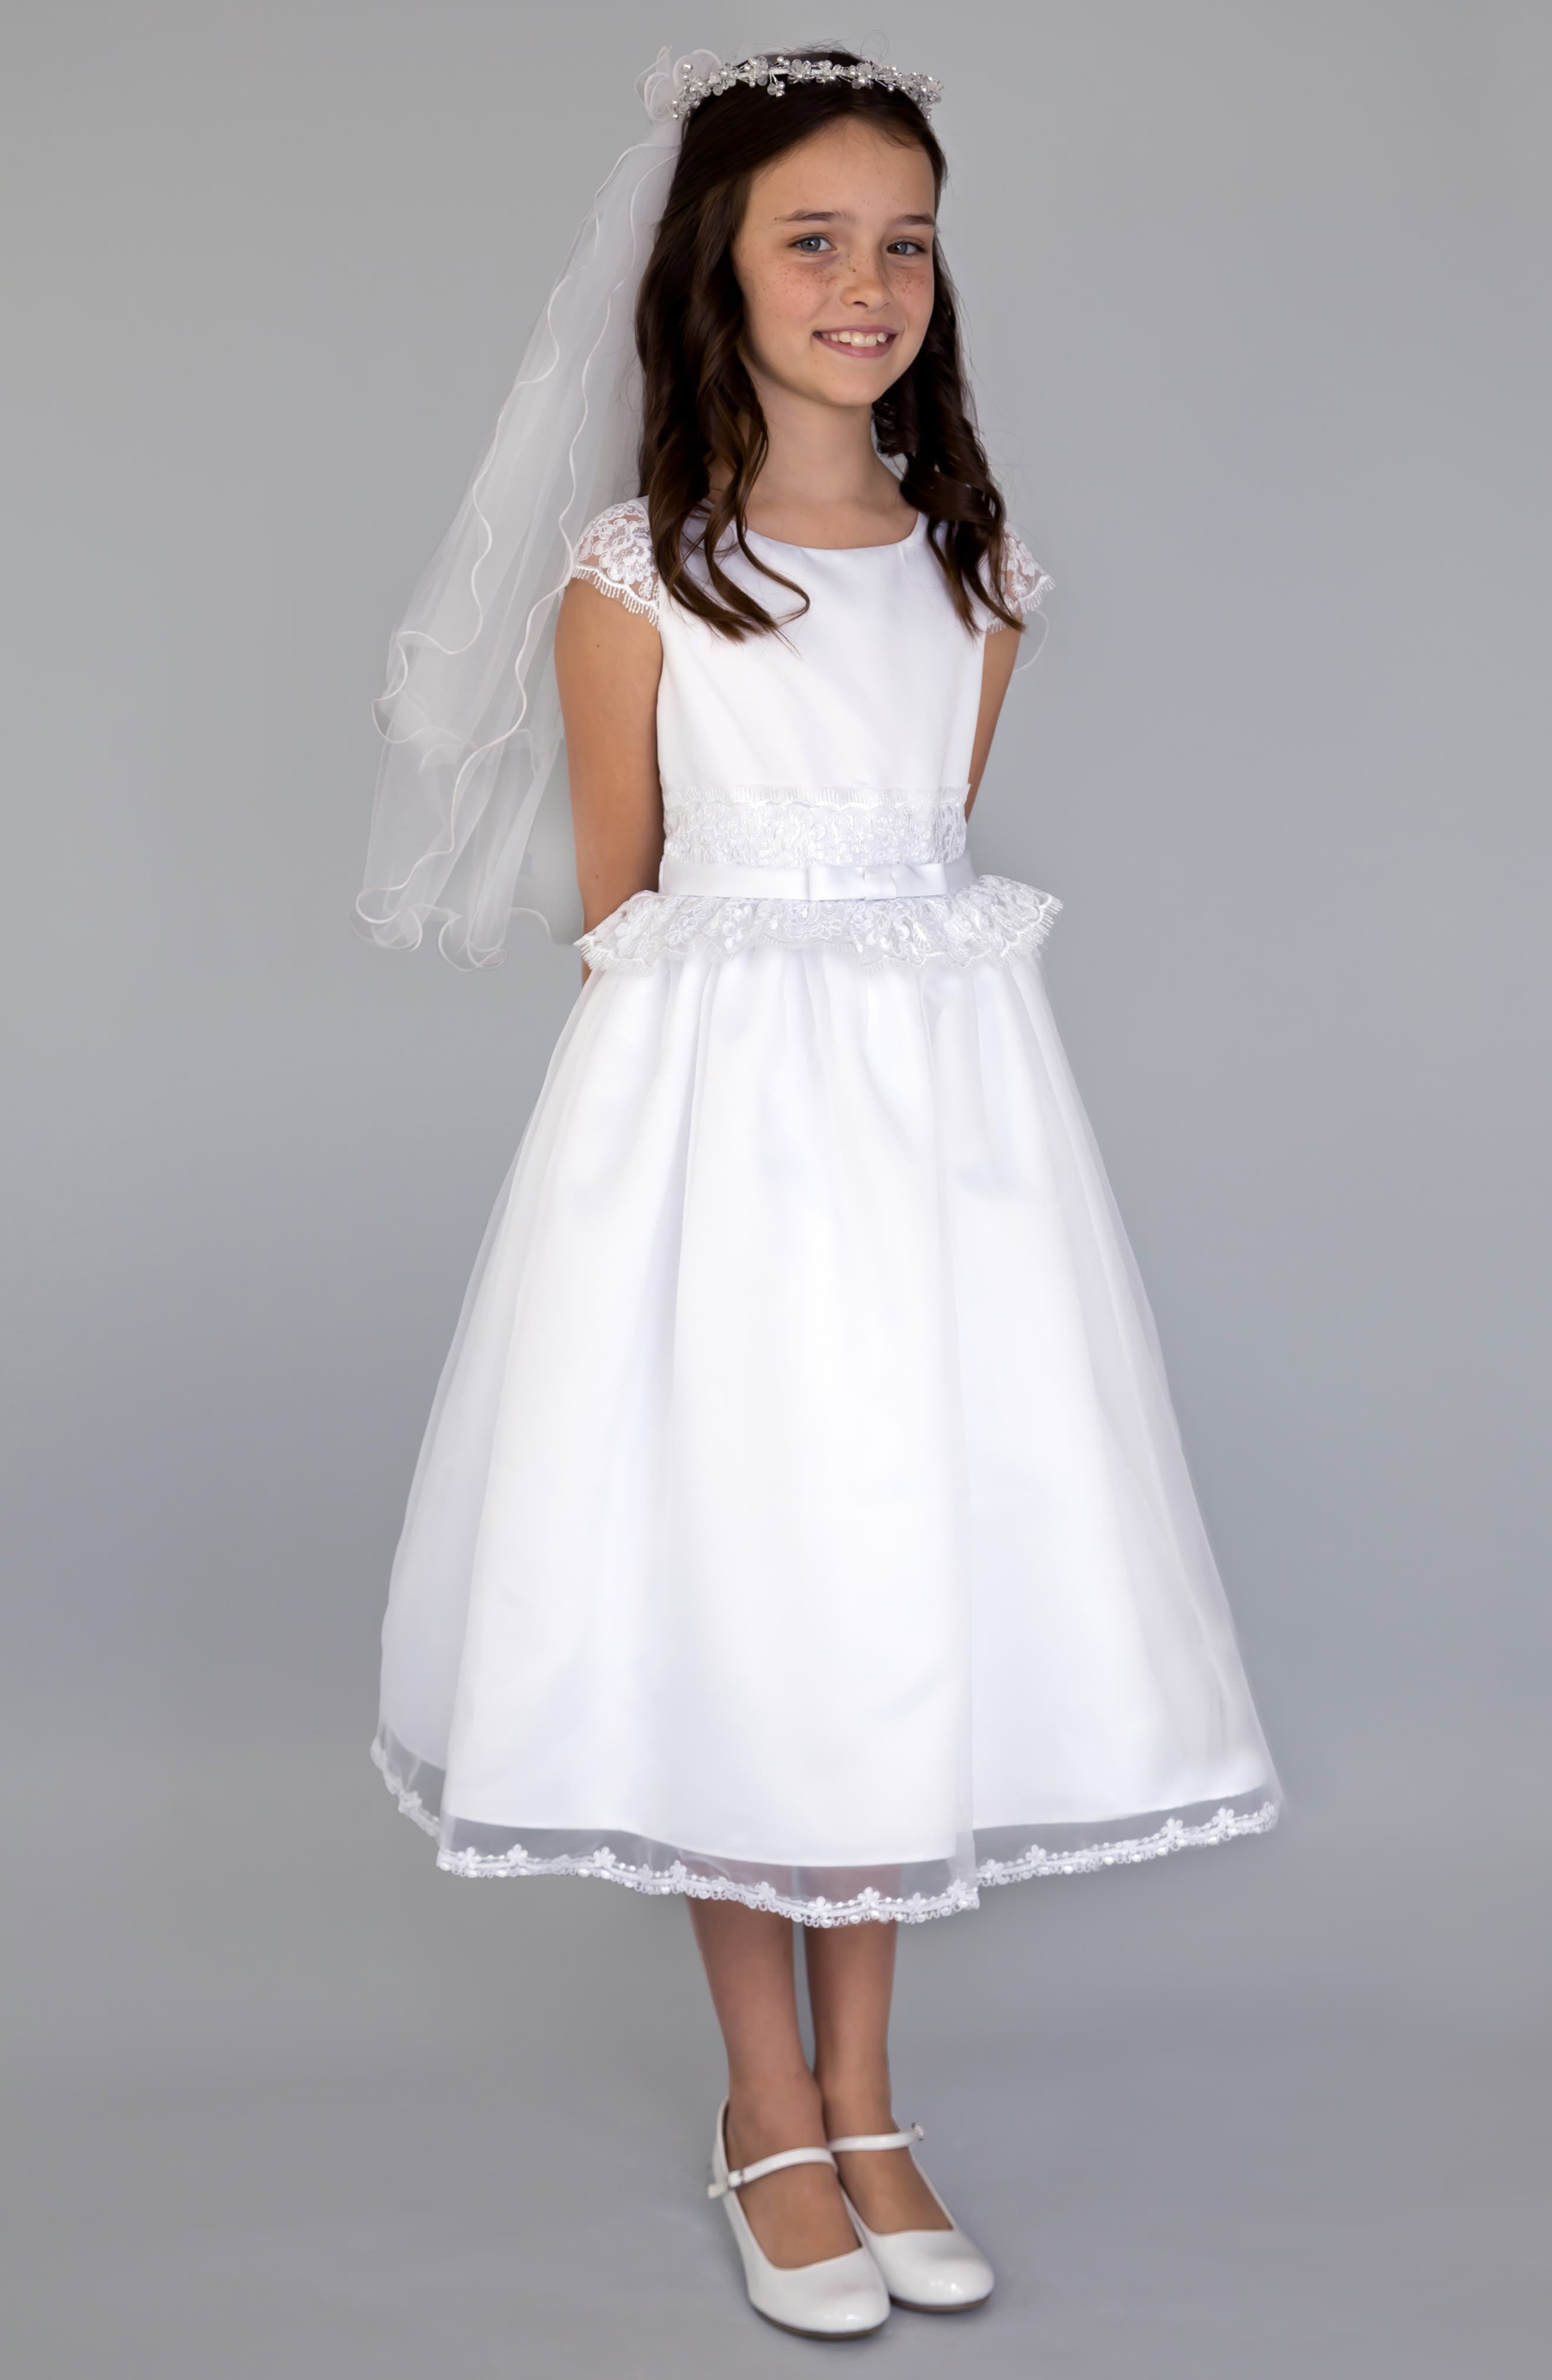 Lace Peplum Organza Dress,                             Alternate thumbnail 2, color,